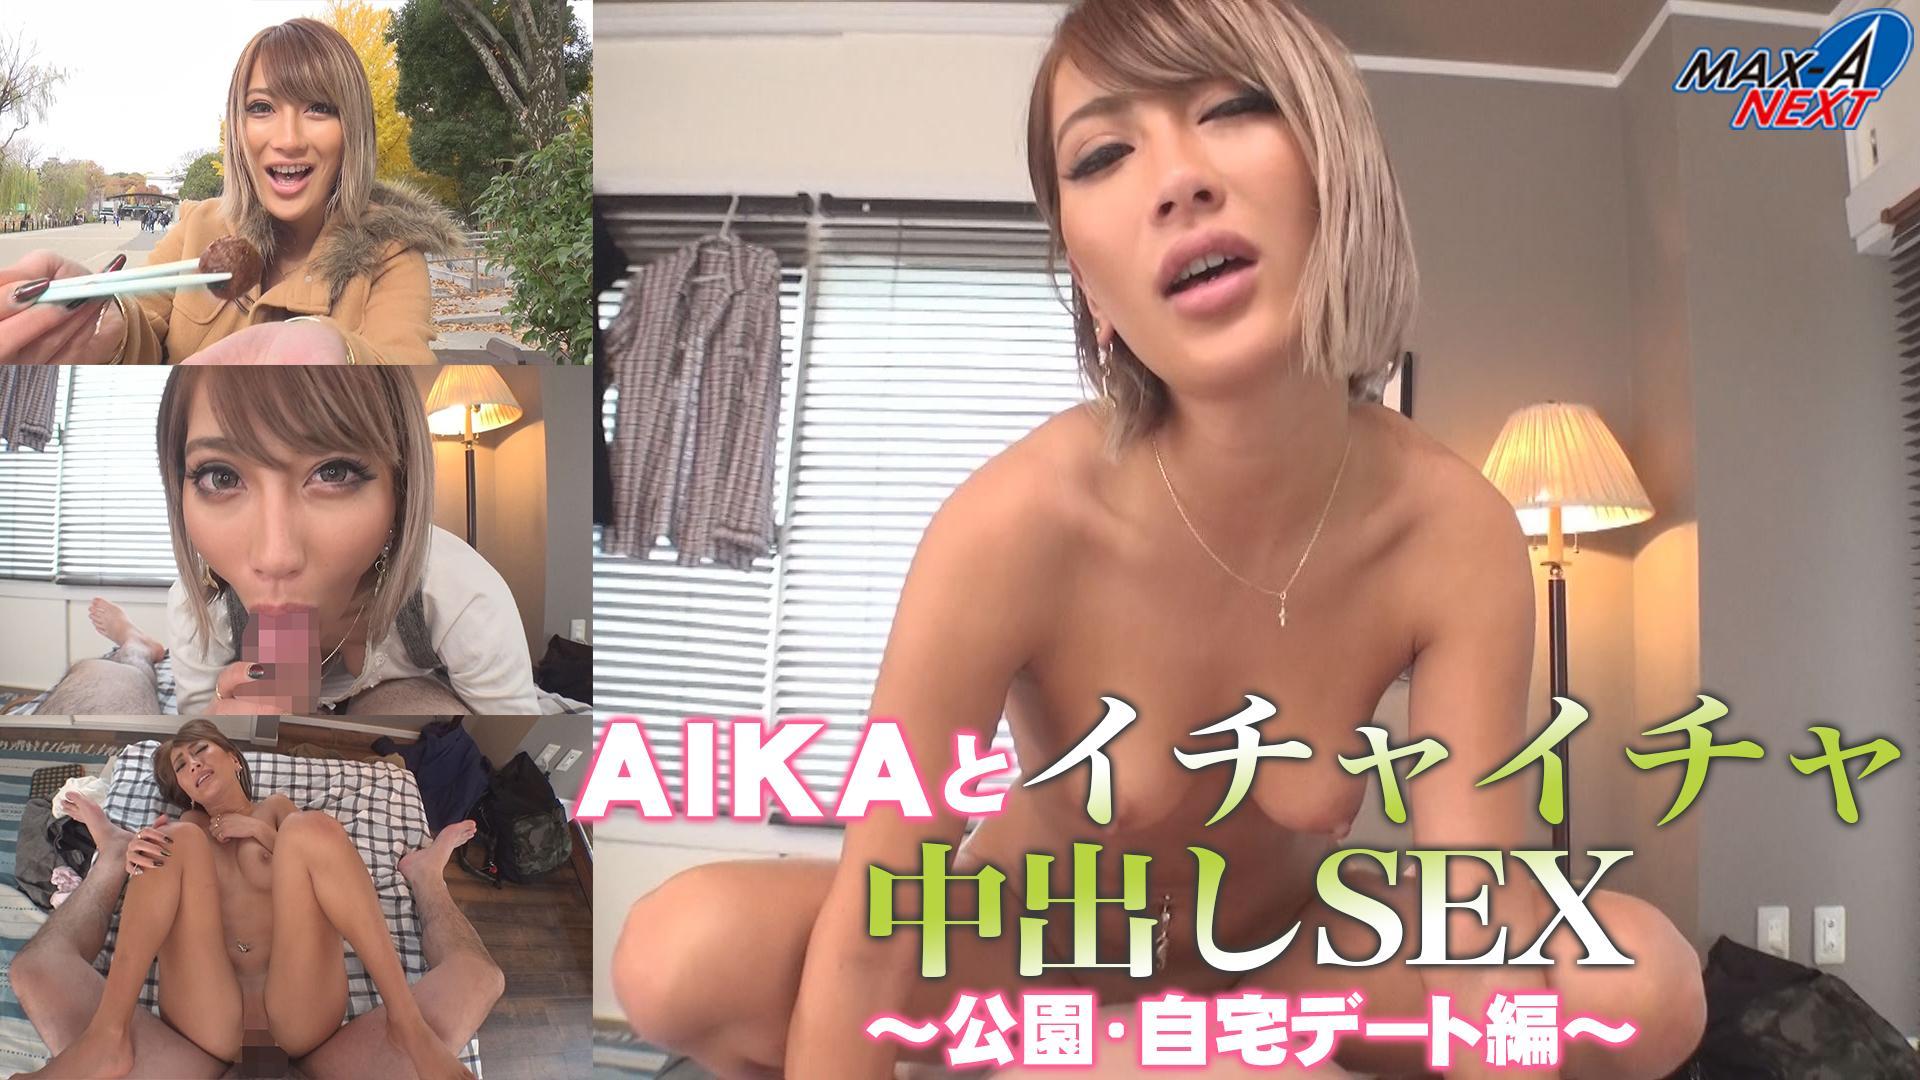 AIKAとイチャイチャ中出しSEX~公園・自宅デート編~ AIKA